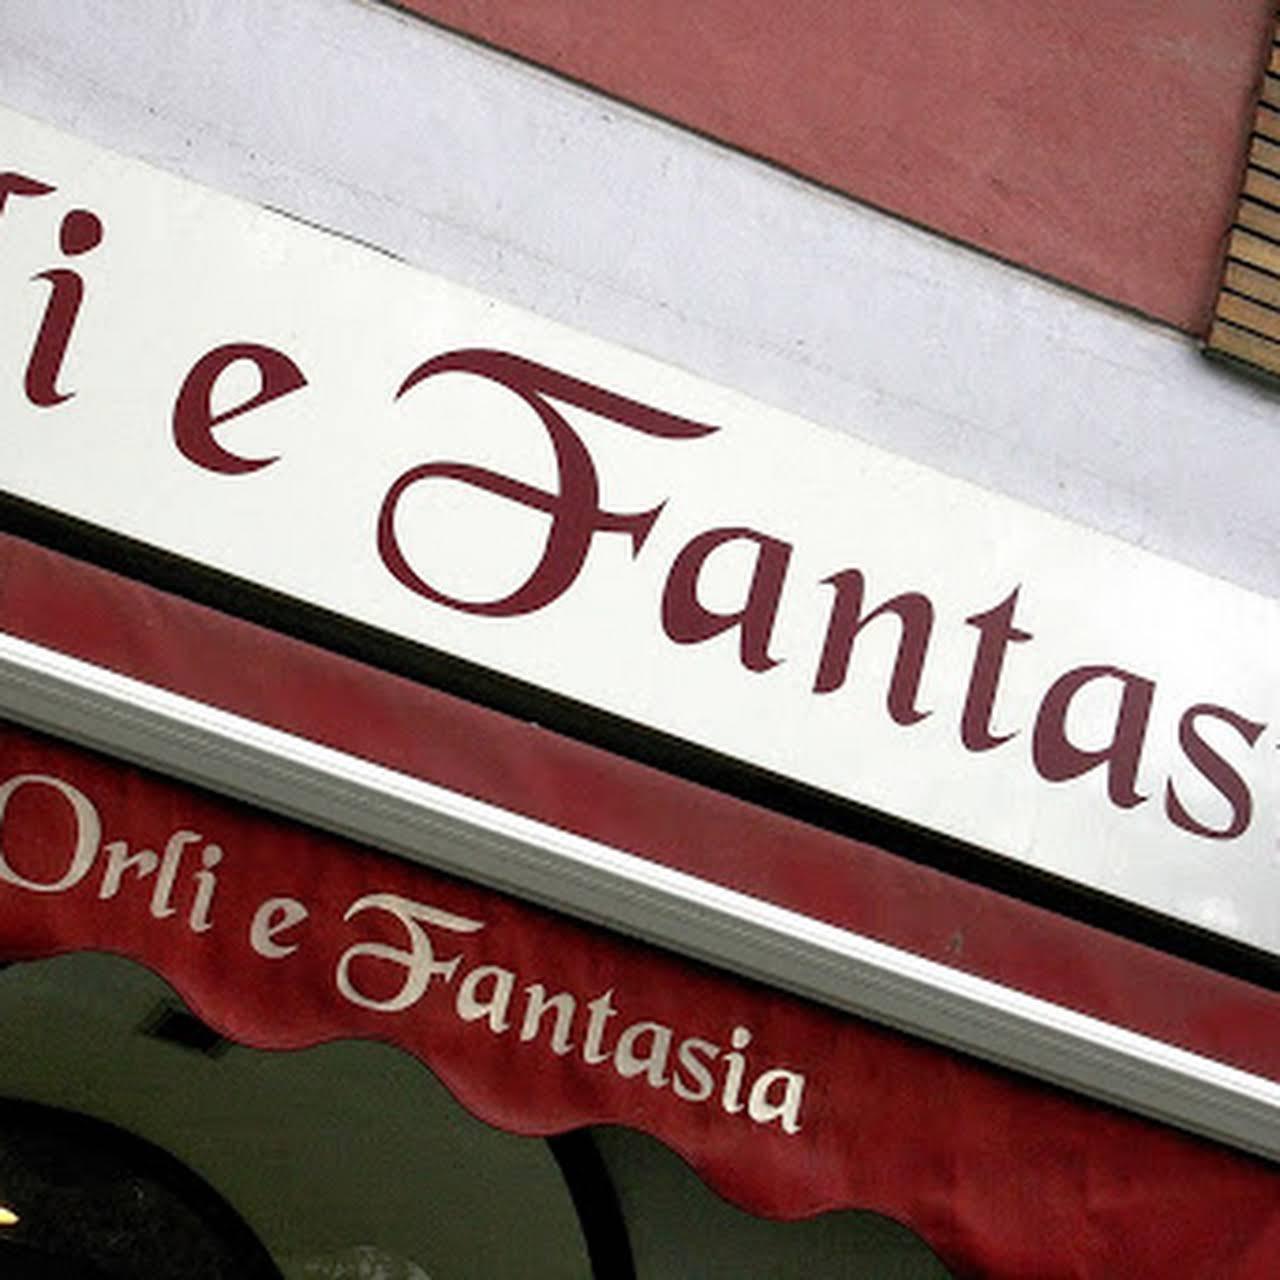 Forniture Per Tappezzieri Roma orli e fantasia sartoria - tappezzeria - tappezziere a roma